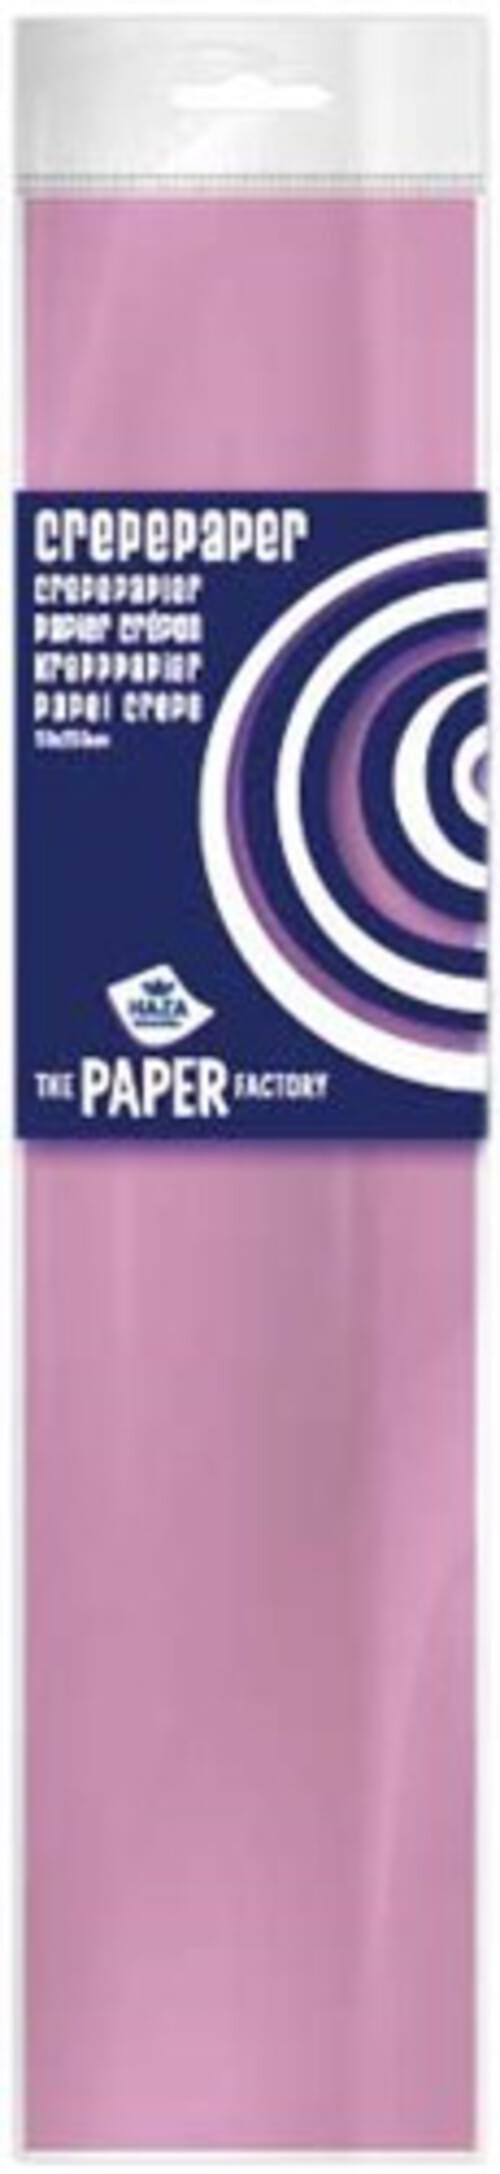 Crepe Paper Lilac 10pk